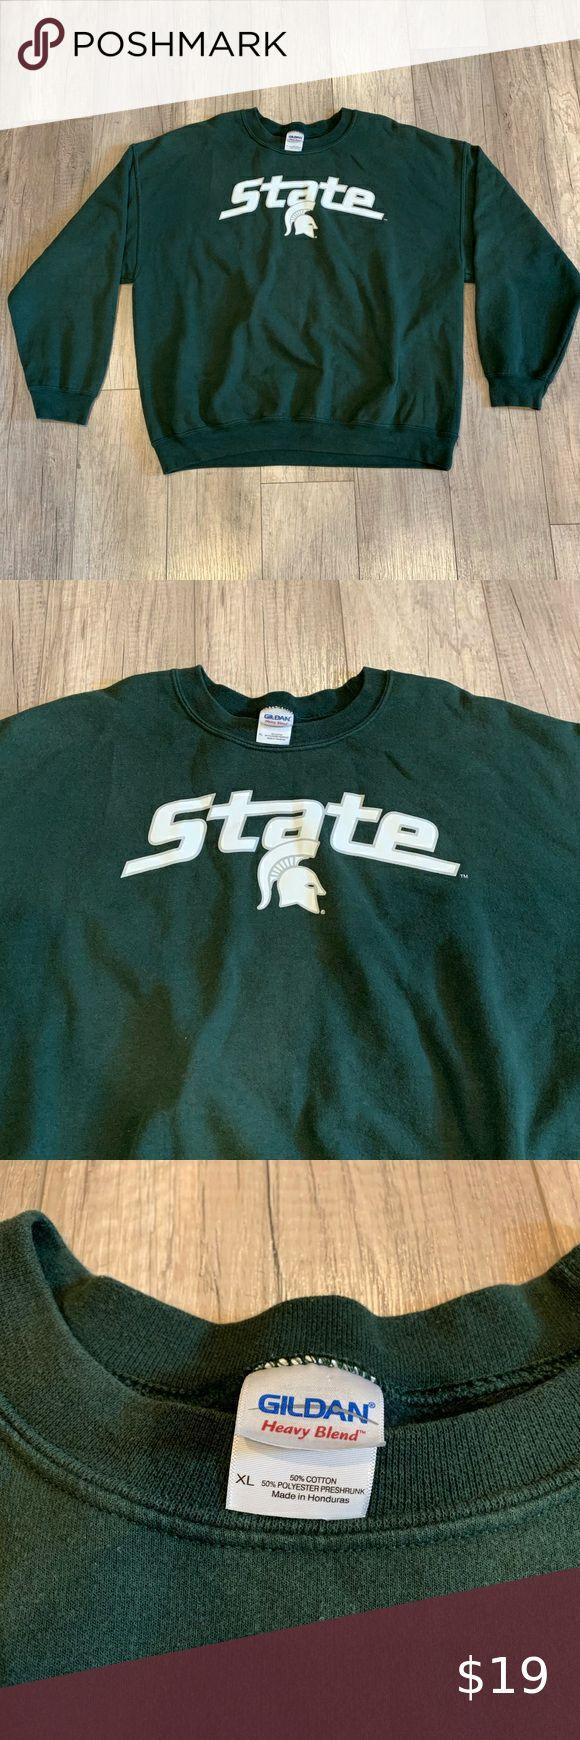 Michigan State Spartans Crewneck Sweatshirt Sweatshirts Long Sleeve Tshirt Men Crew Neck Sweatshirt [ 1740 x 580 Pixel ]